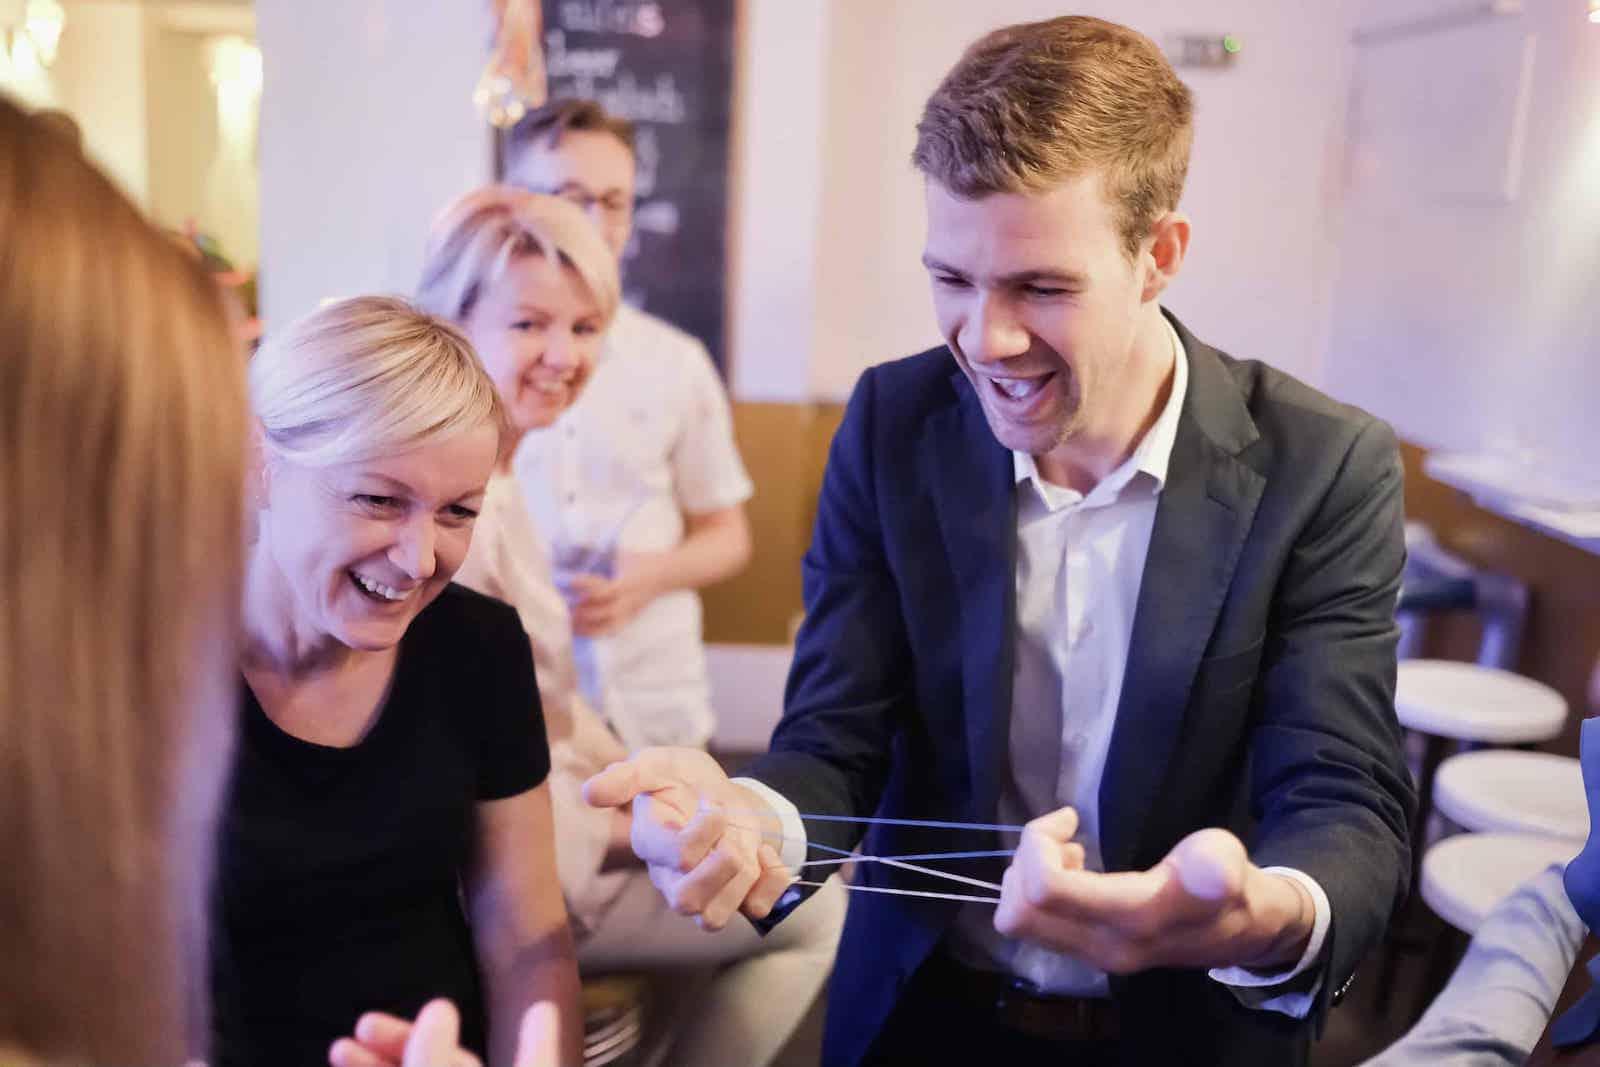 Zauberer Frankfurt mit Publikum beim zaubern